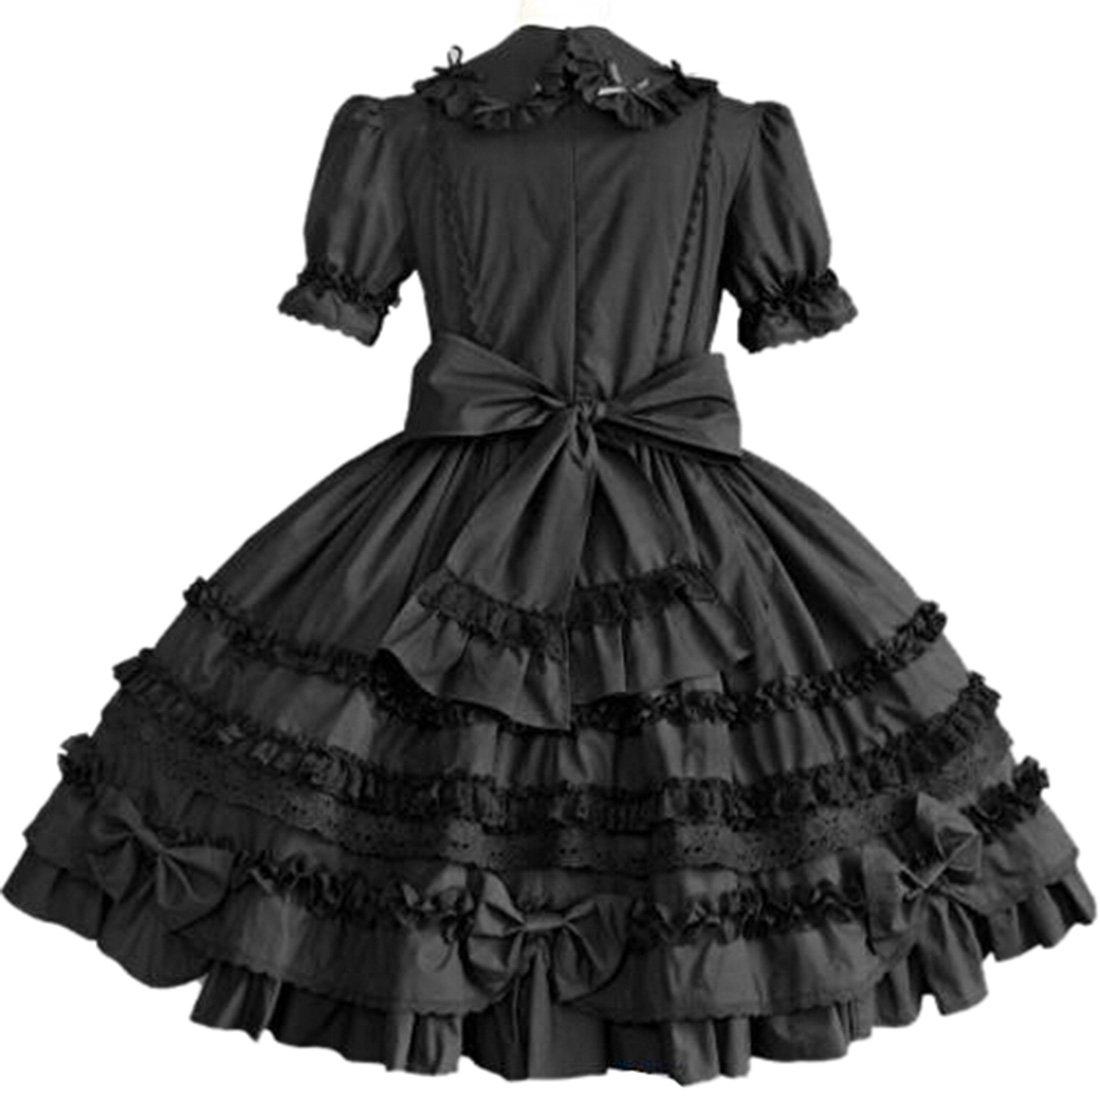 Partiss Women Long Sleeve Multi Layer Sweet Lolita Gothic Lolita Dress, XS, Black by Partiss (Image #2)